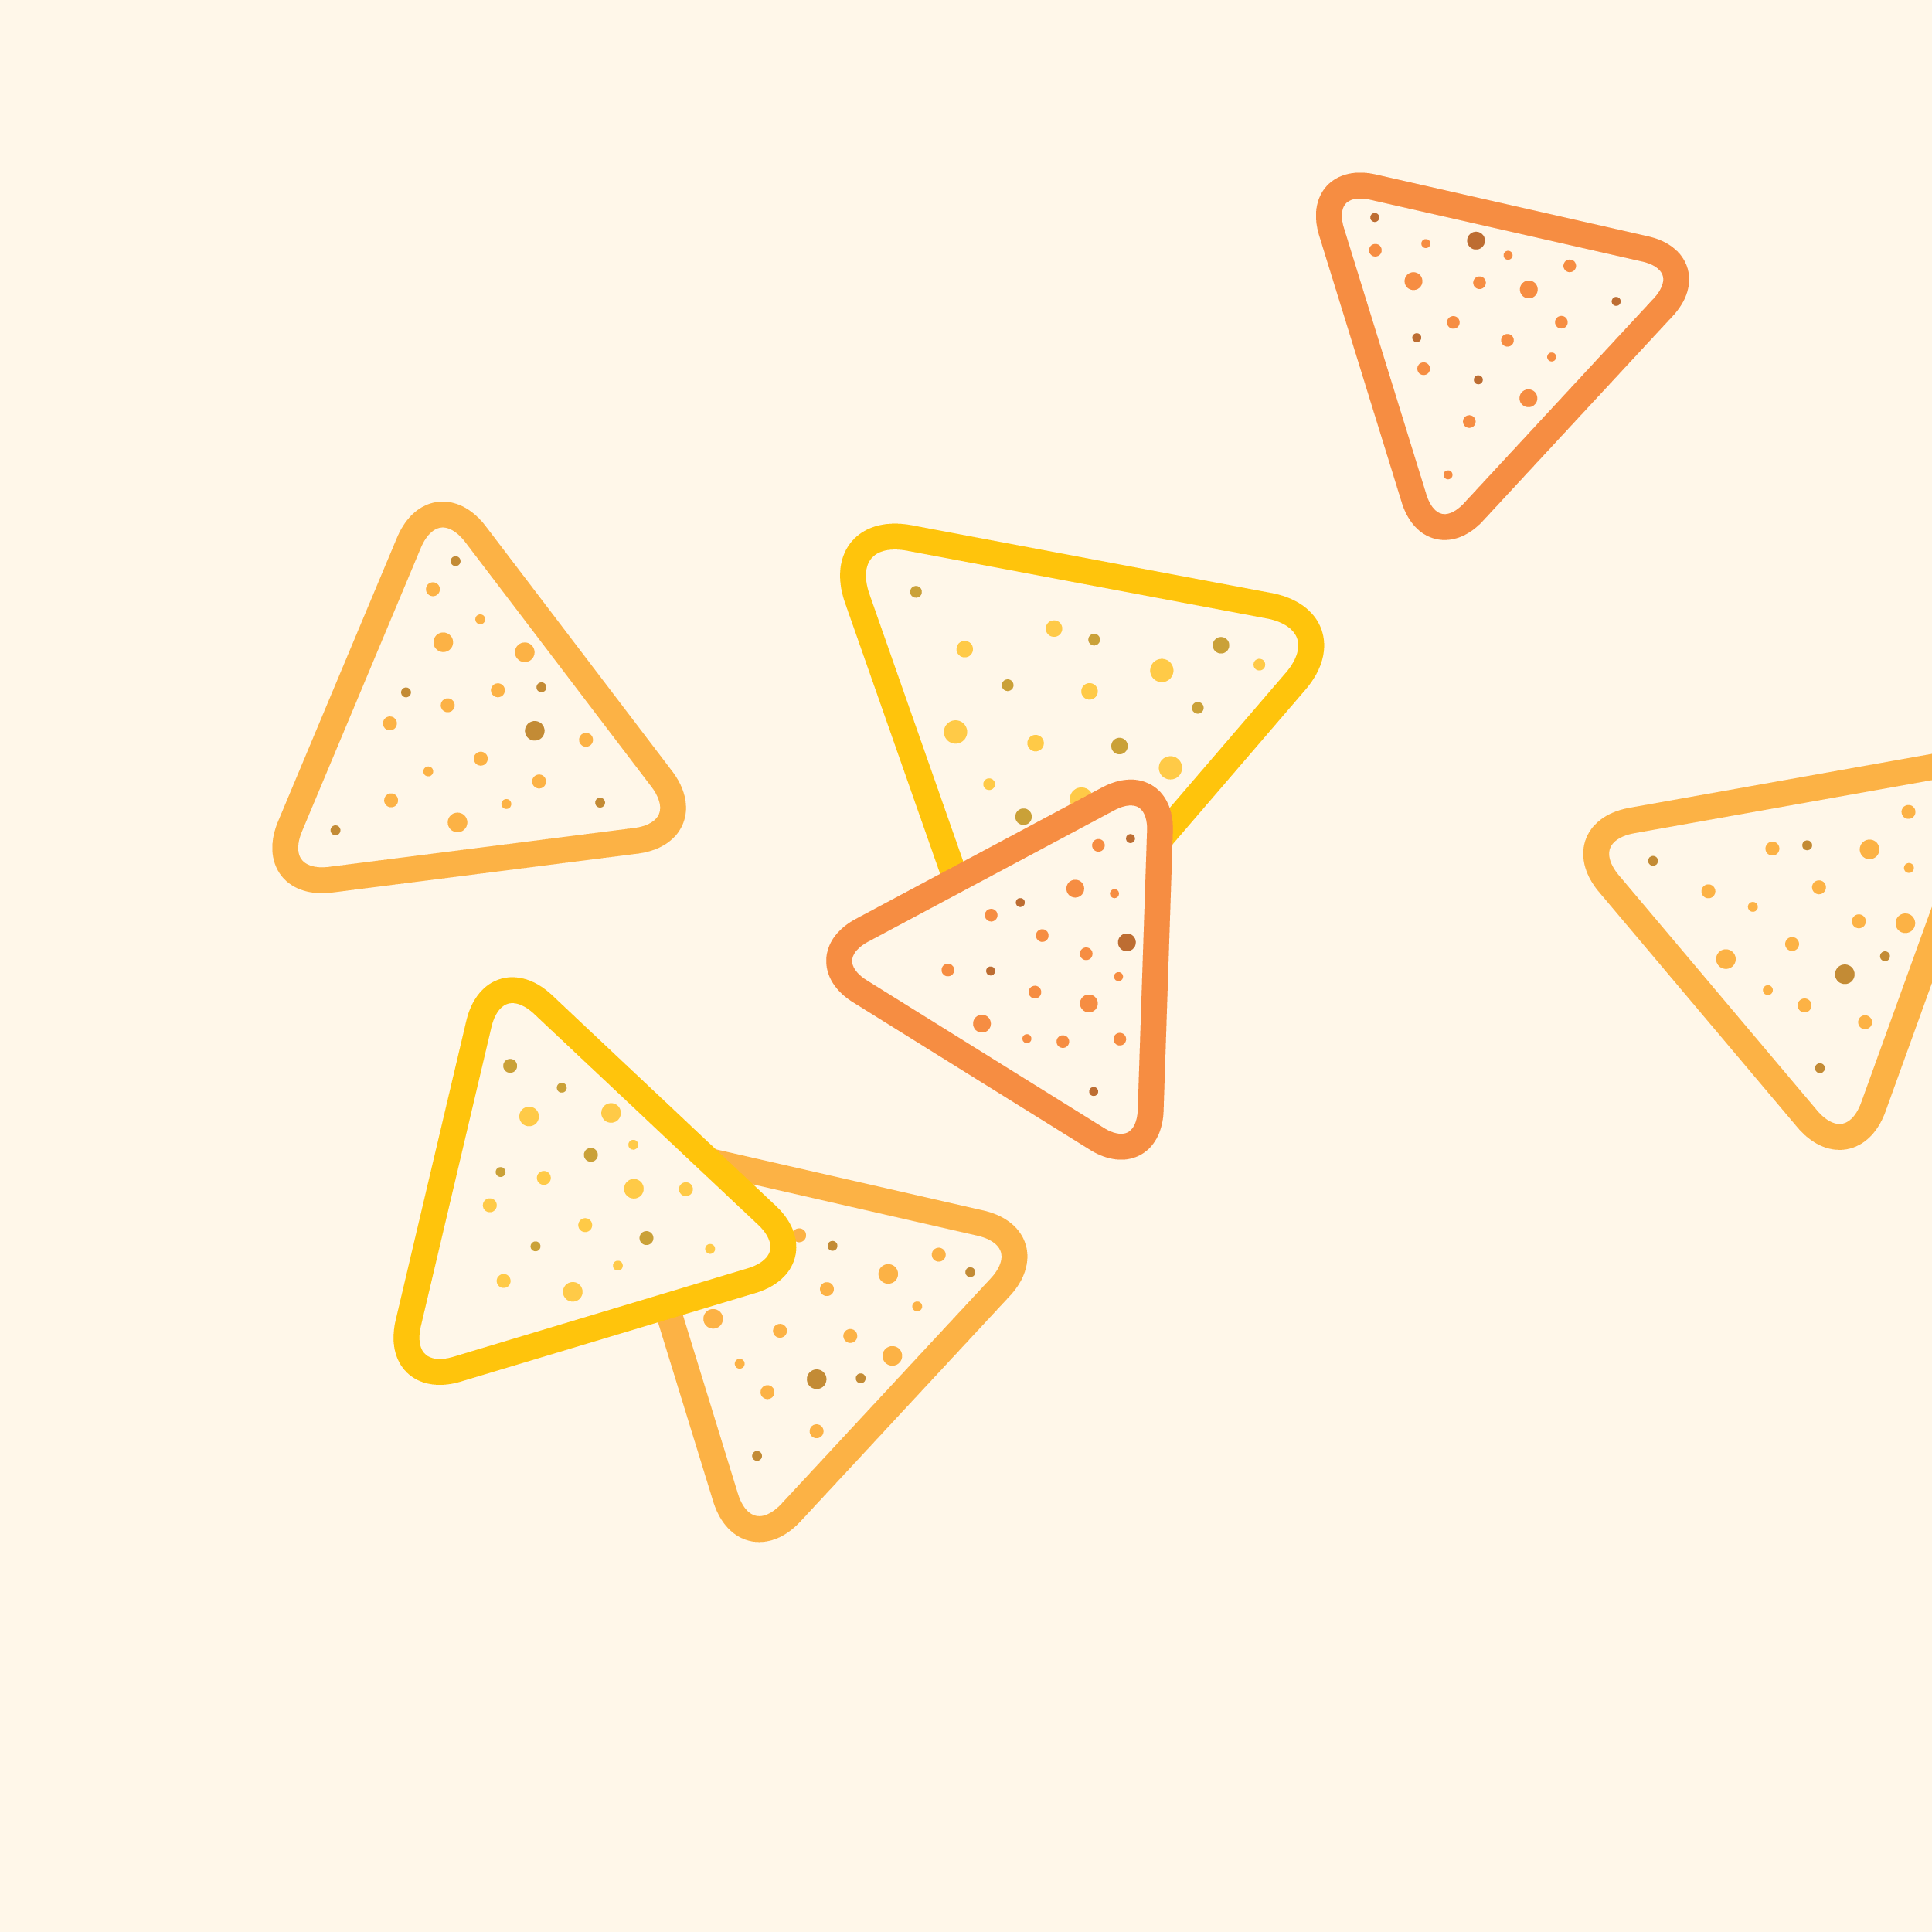 049-tortilla-49